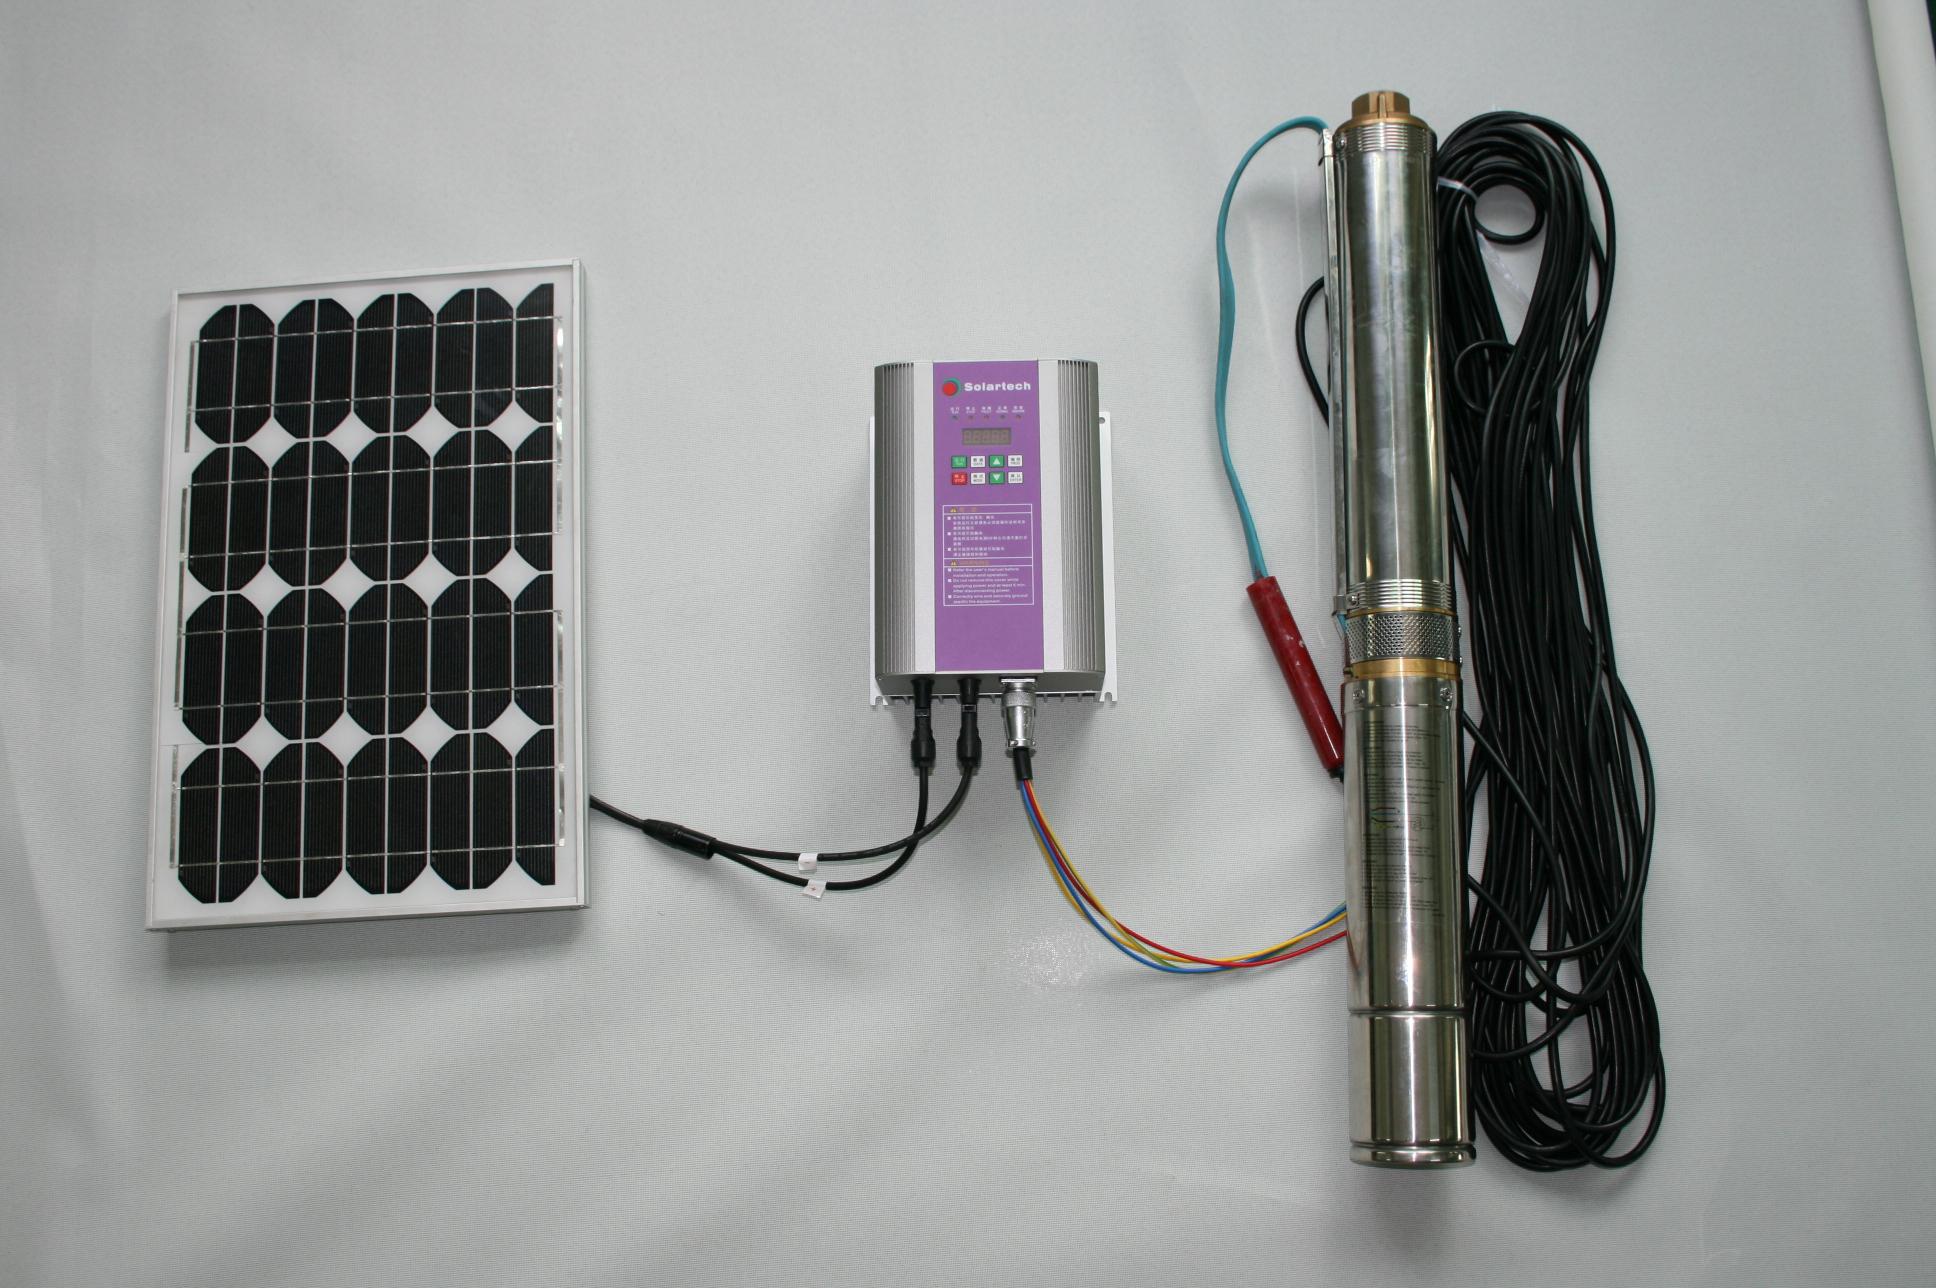 DC Solar Pump 600W 48V Solar Pumping System